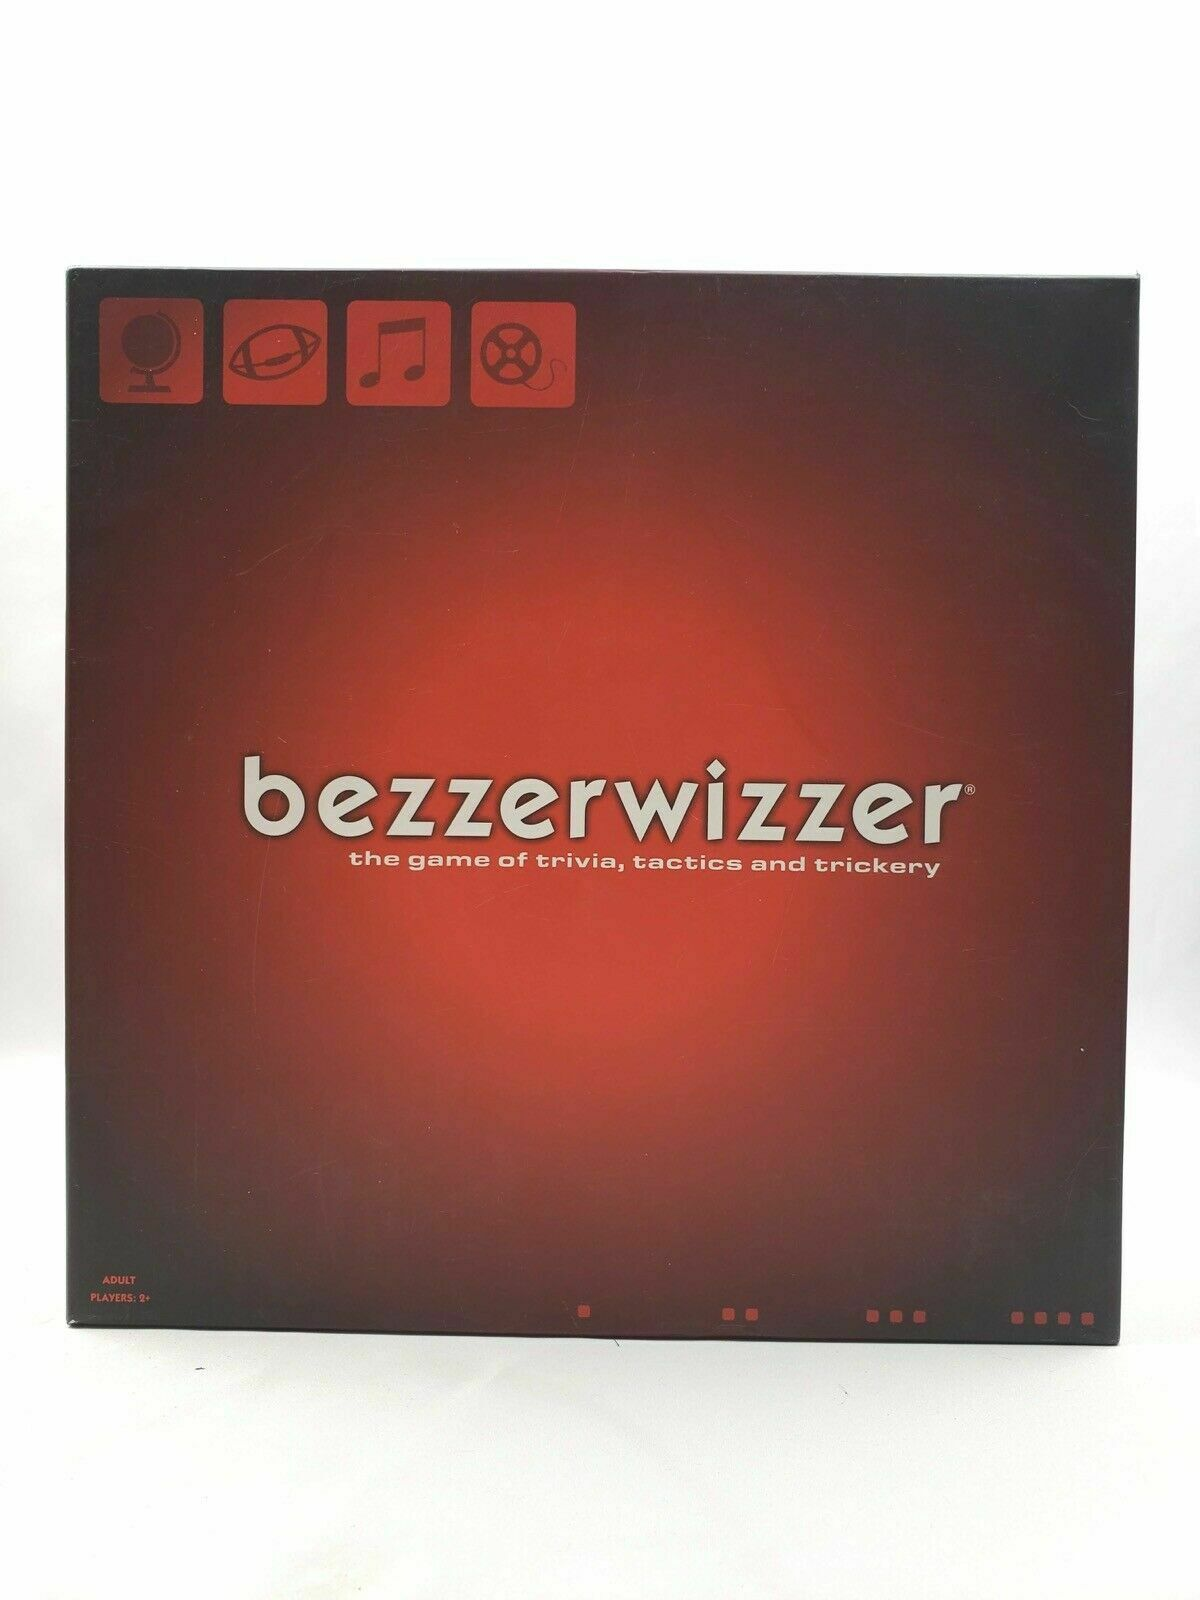 Juego De Mesa Bezzerwizzer curiosidades, tácticas & engaños 2008 Mattel Nuevo Sellado